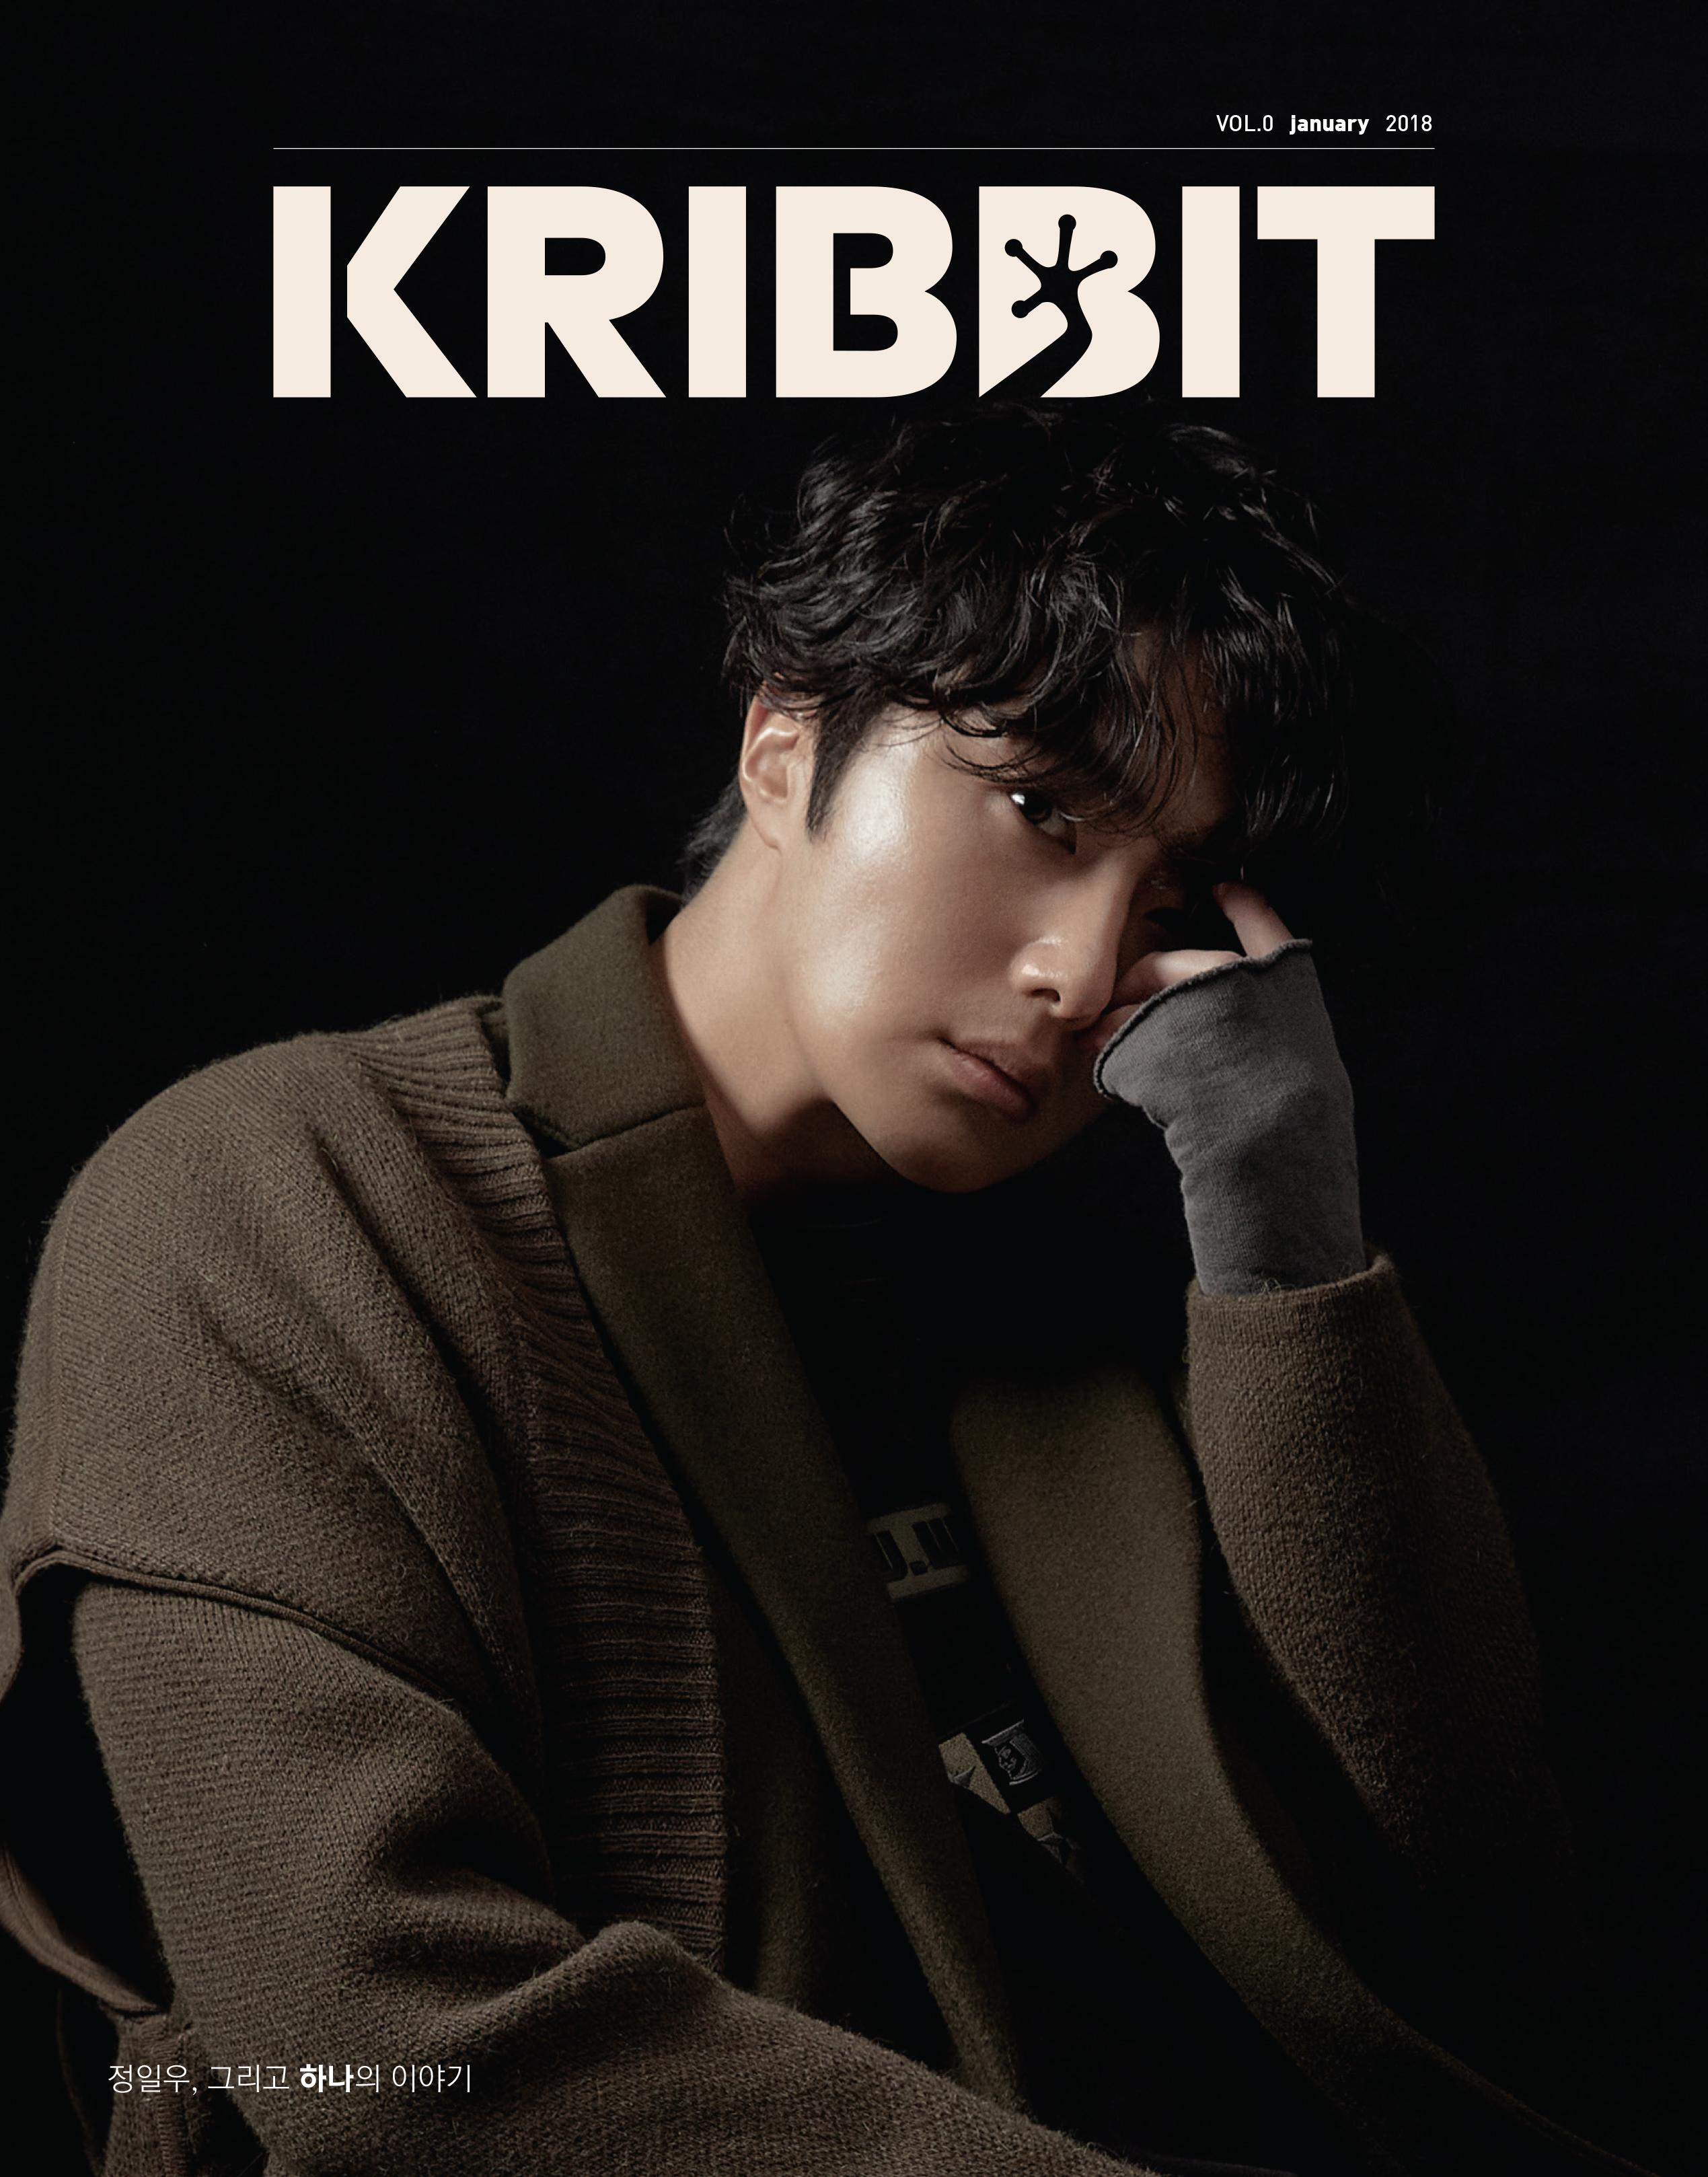 KRIBBIT Vol.0